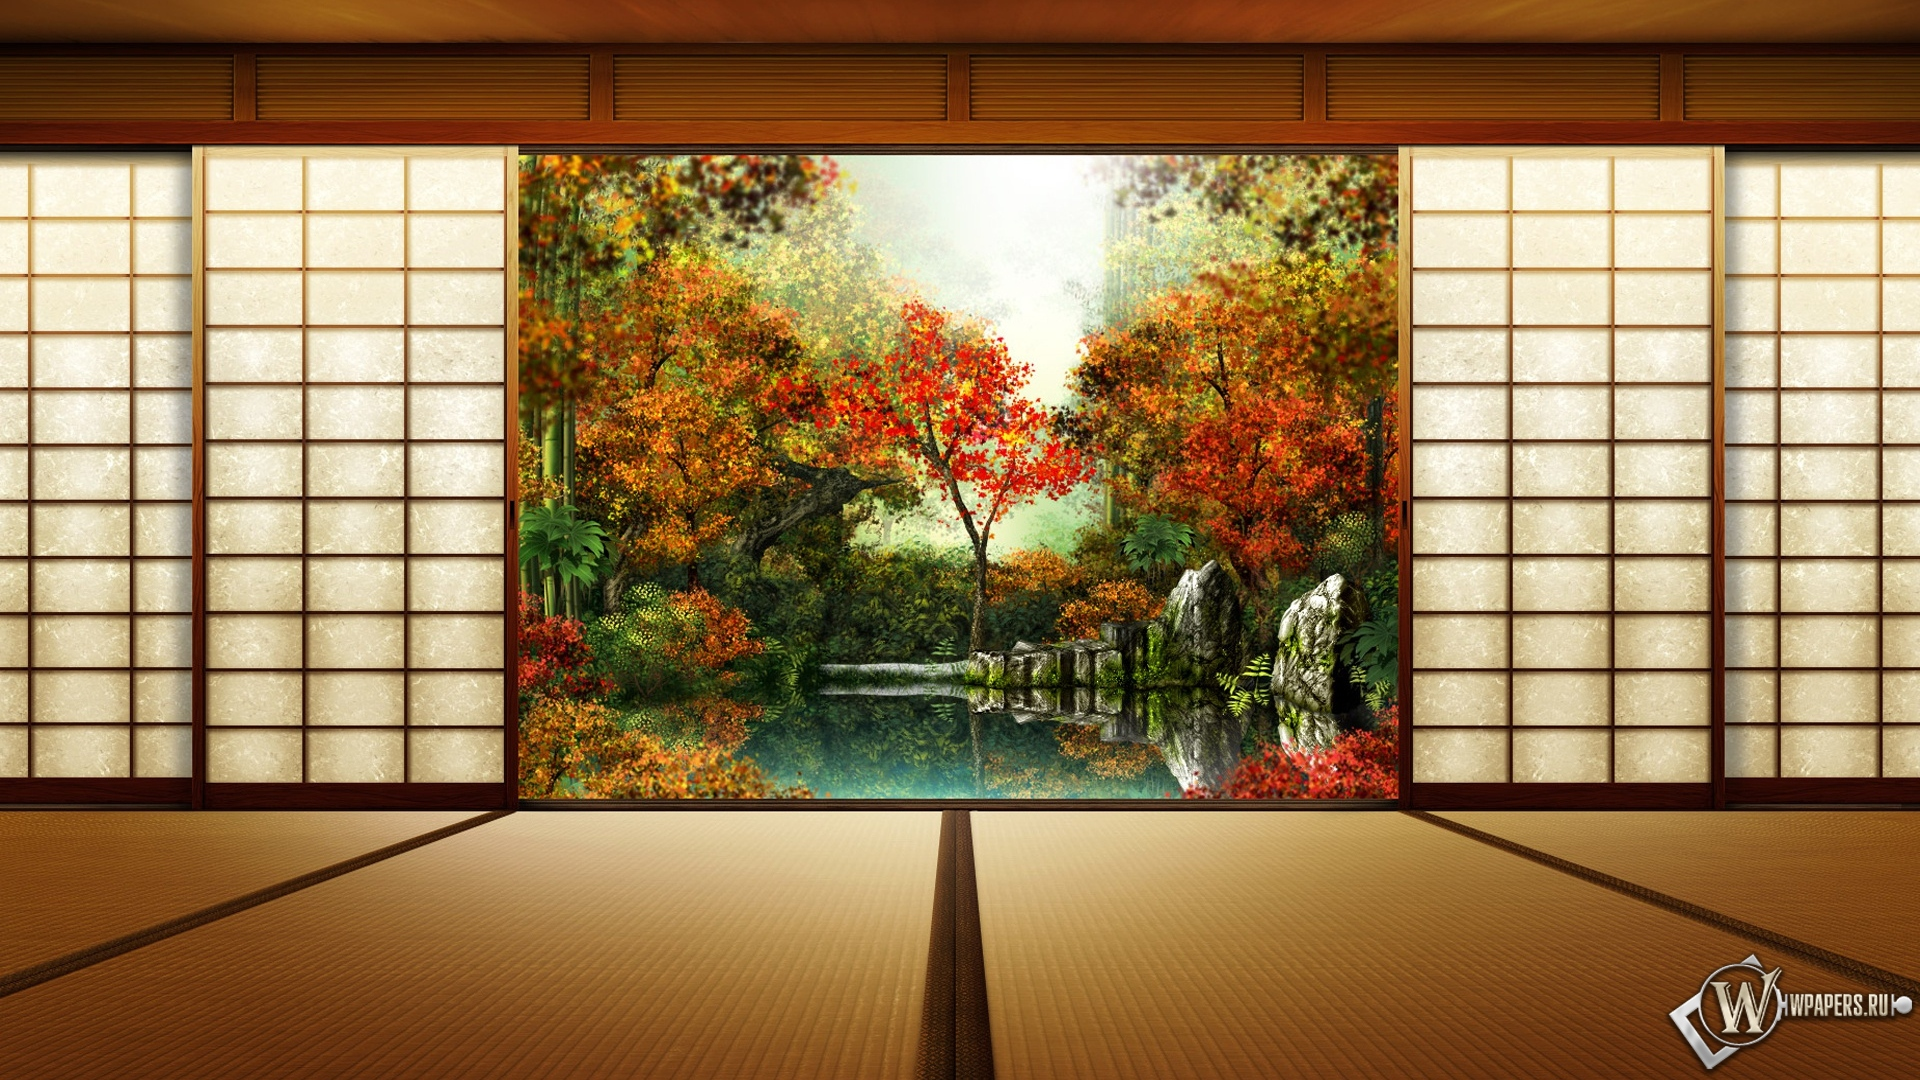 Картинки на рабочий стол с видом осени